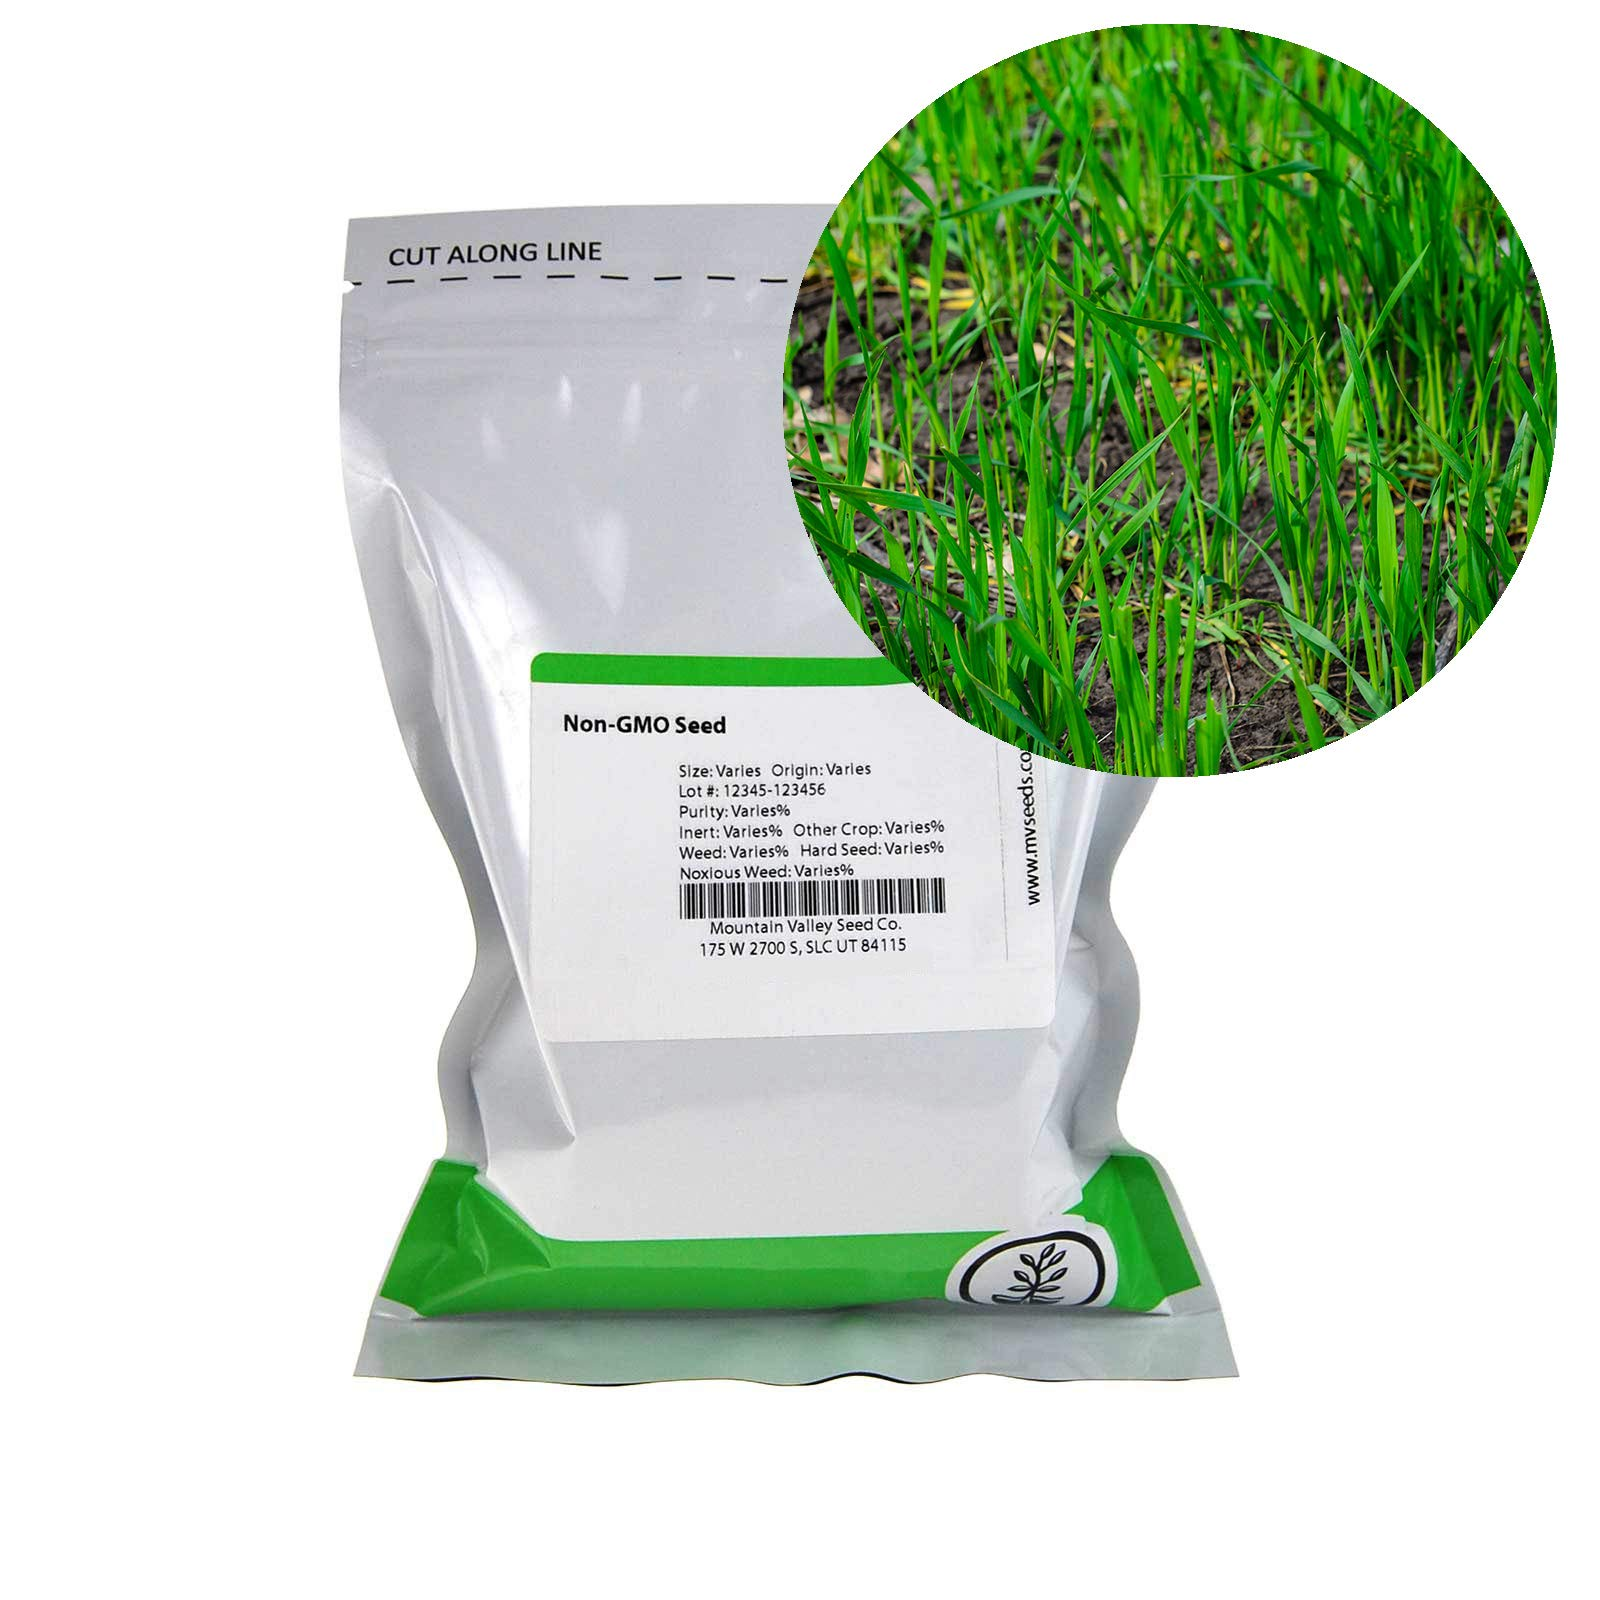 Winter Rye Seeds - 5 Lbs - Non-GMO Rye Grain Cover Crop Seeds